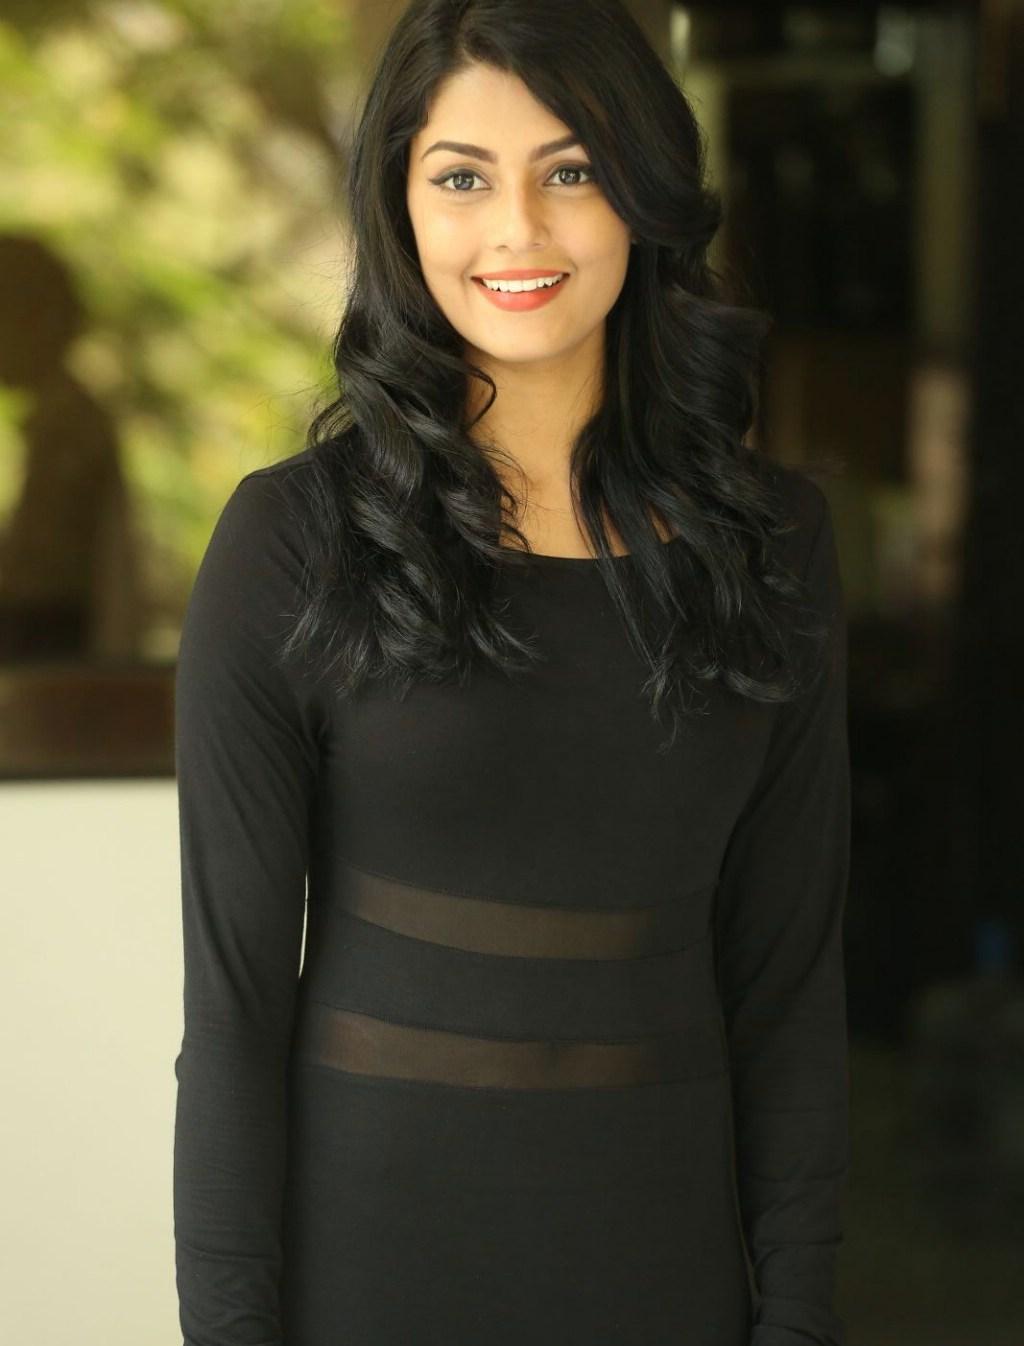 Anisha Ambrose Showcasing Her Sexy Figure In Black Dress -2032